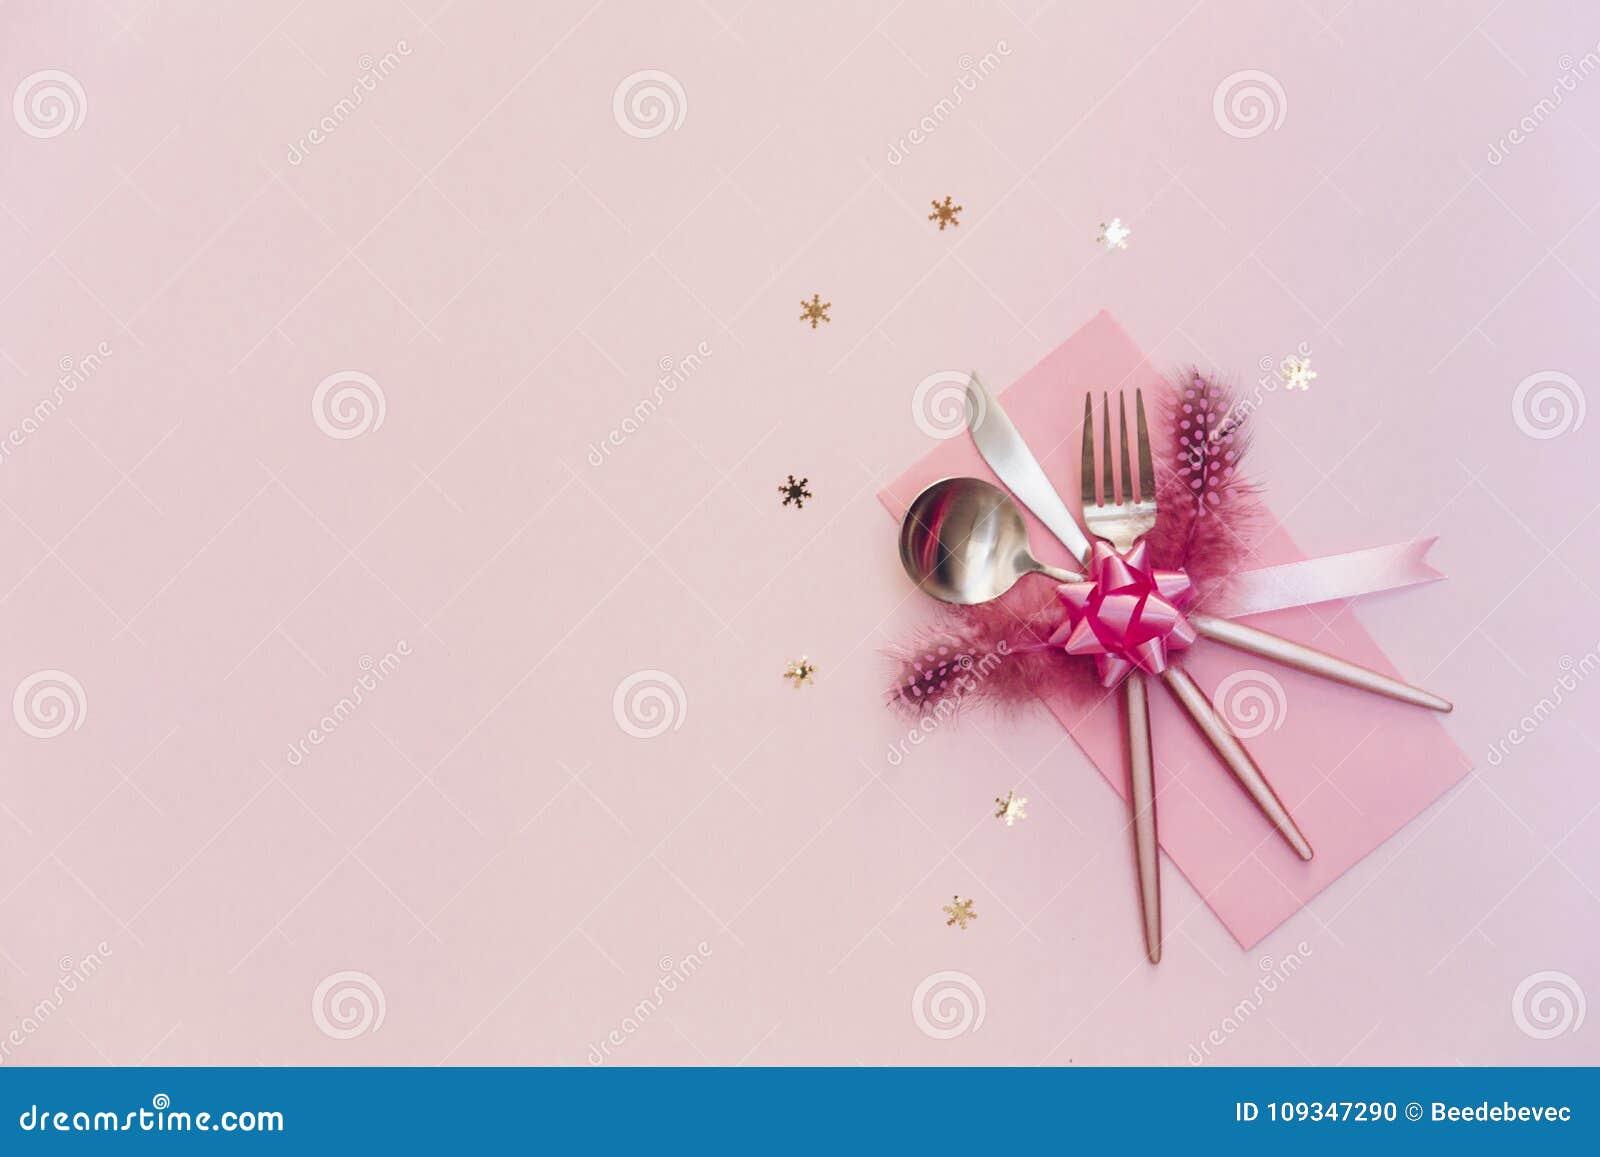 Silverware партии взгляд сверху Нож и ложка вилки над розовой предпосылкой